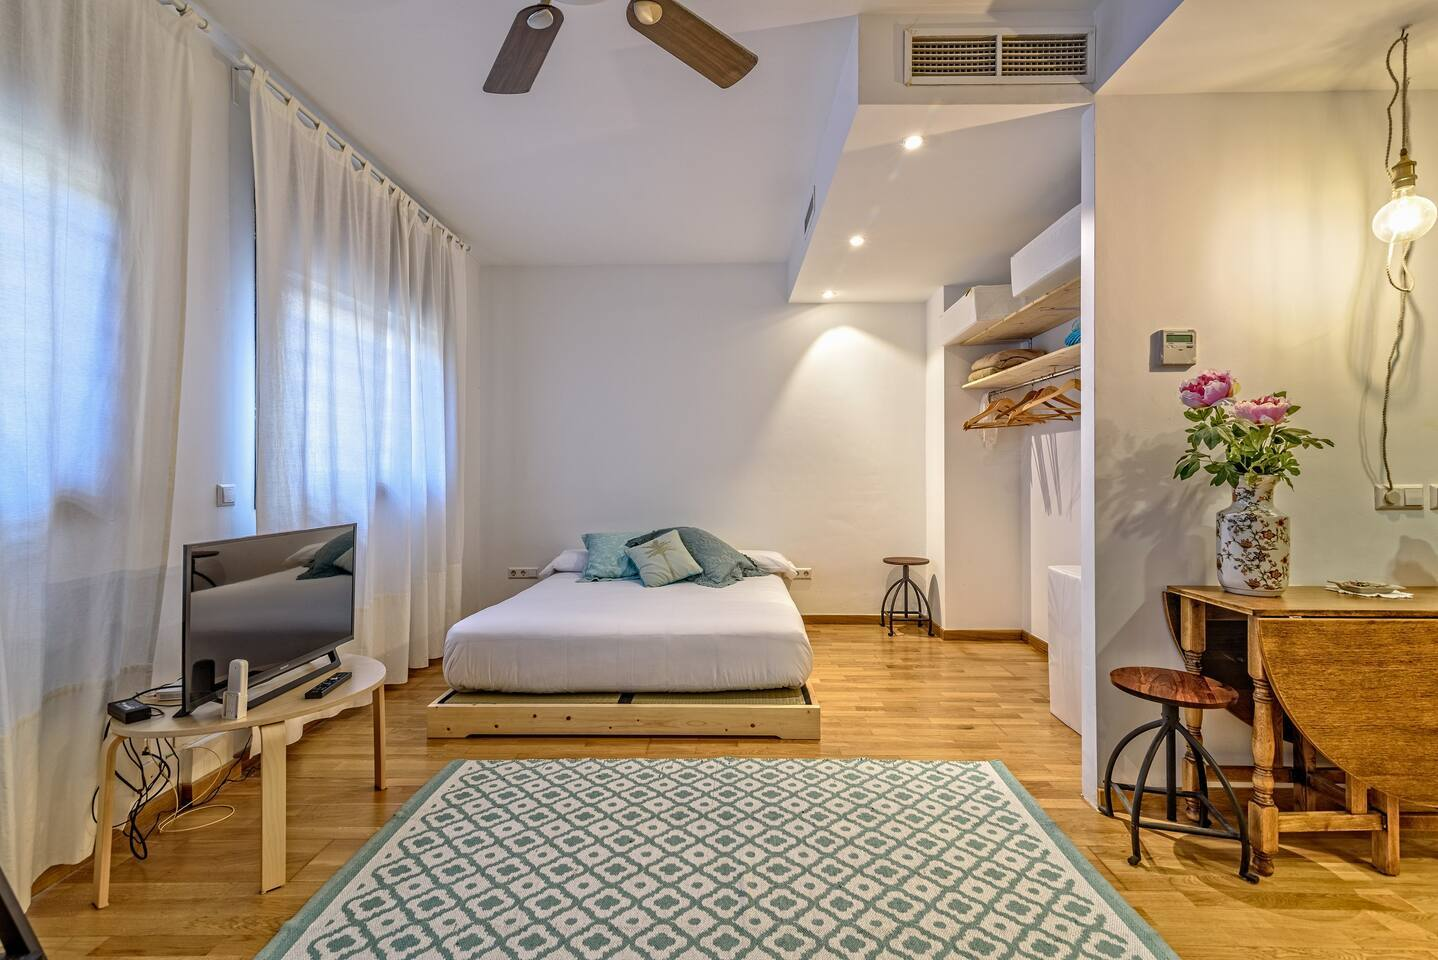 Ivana s Airbnb